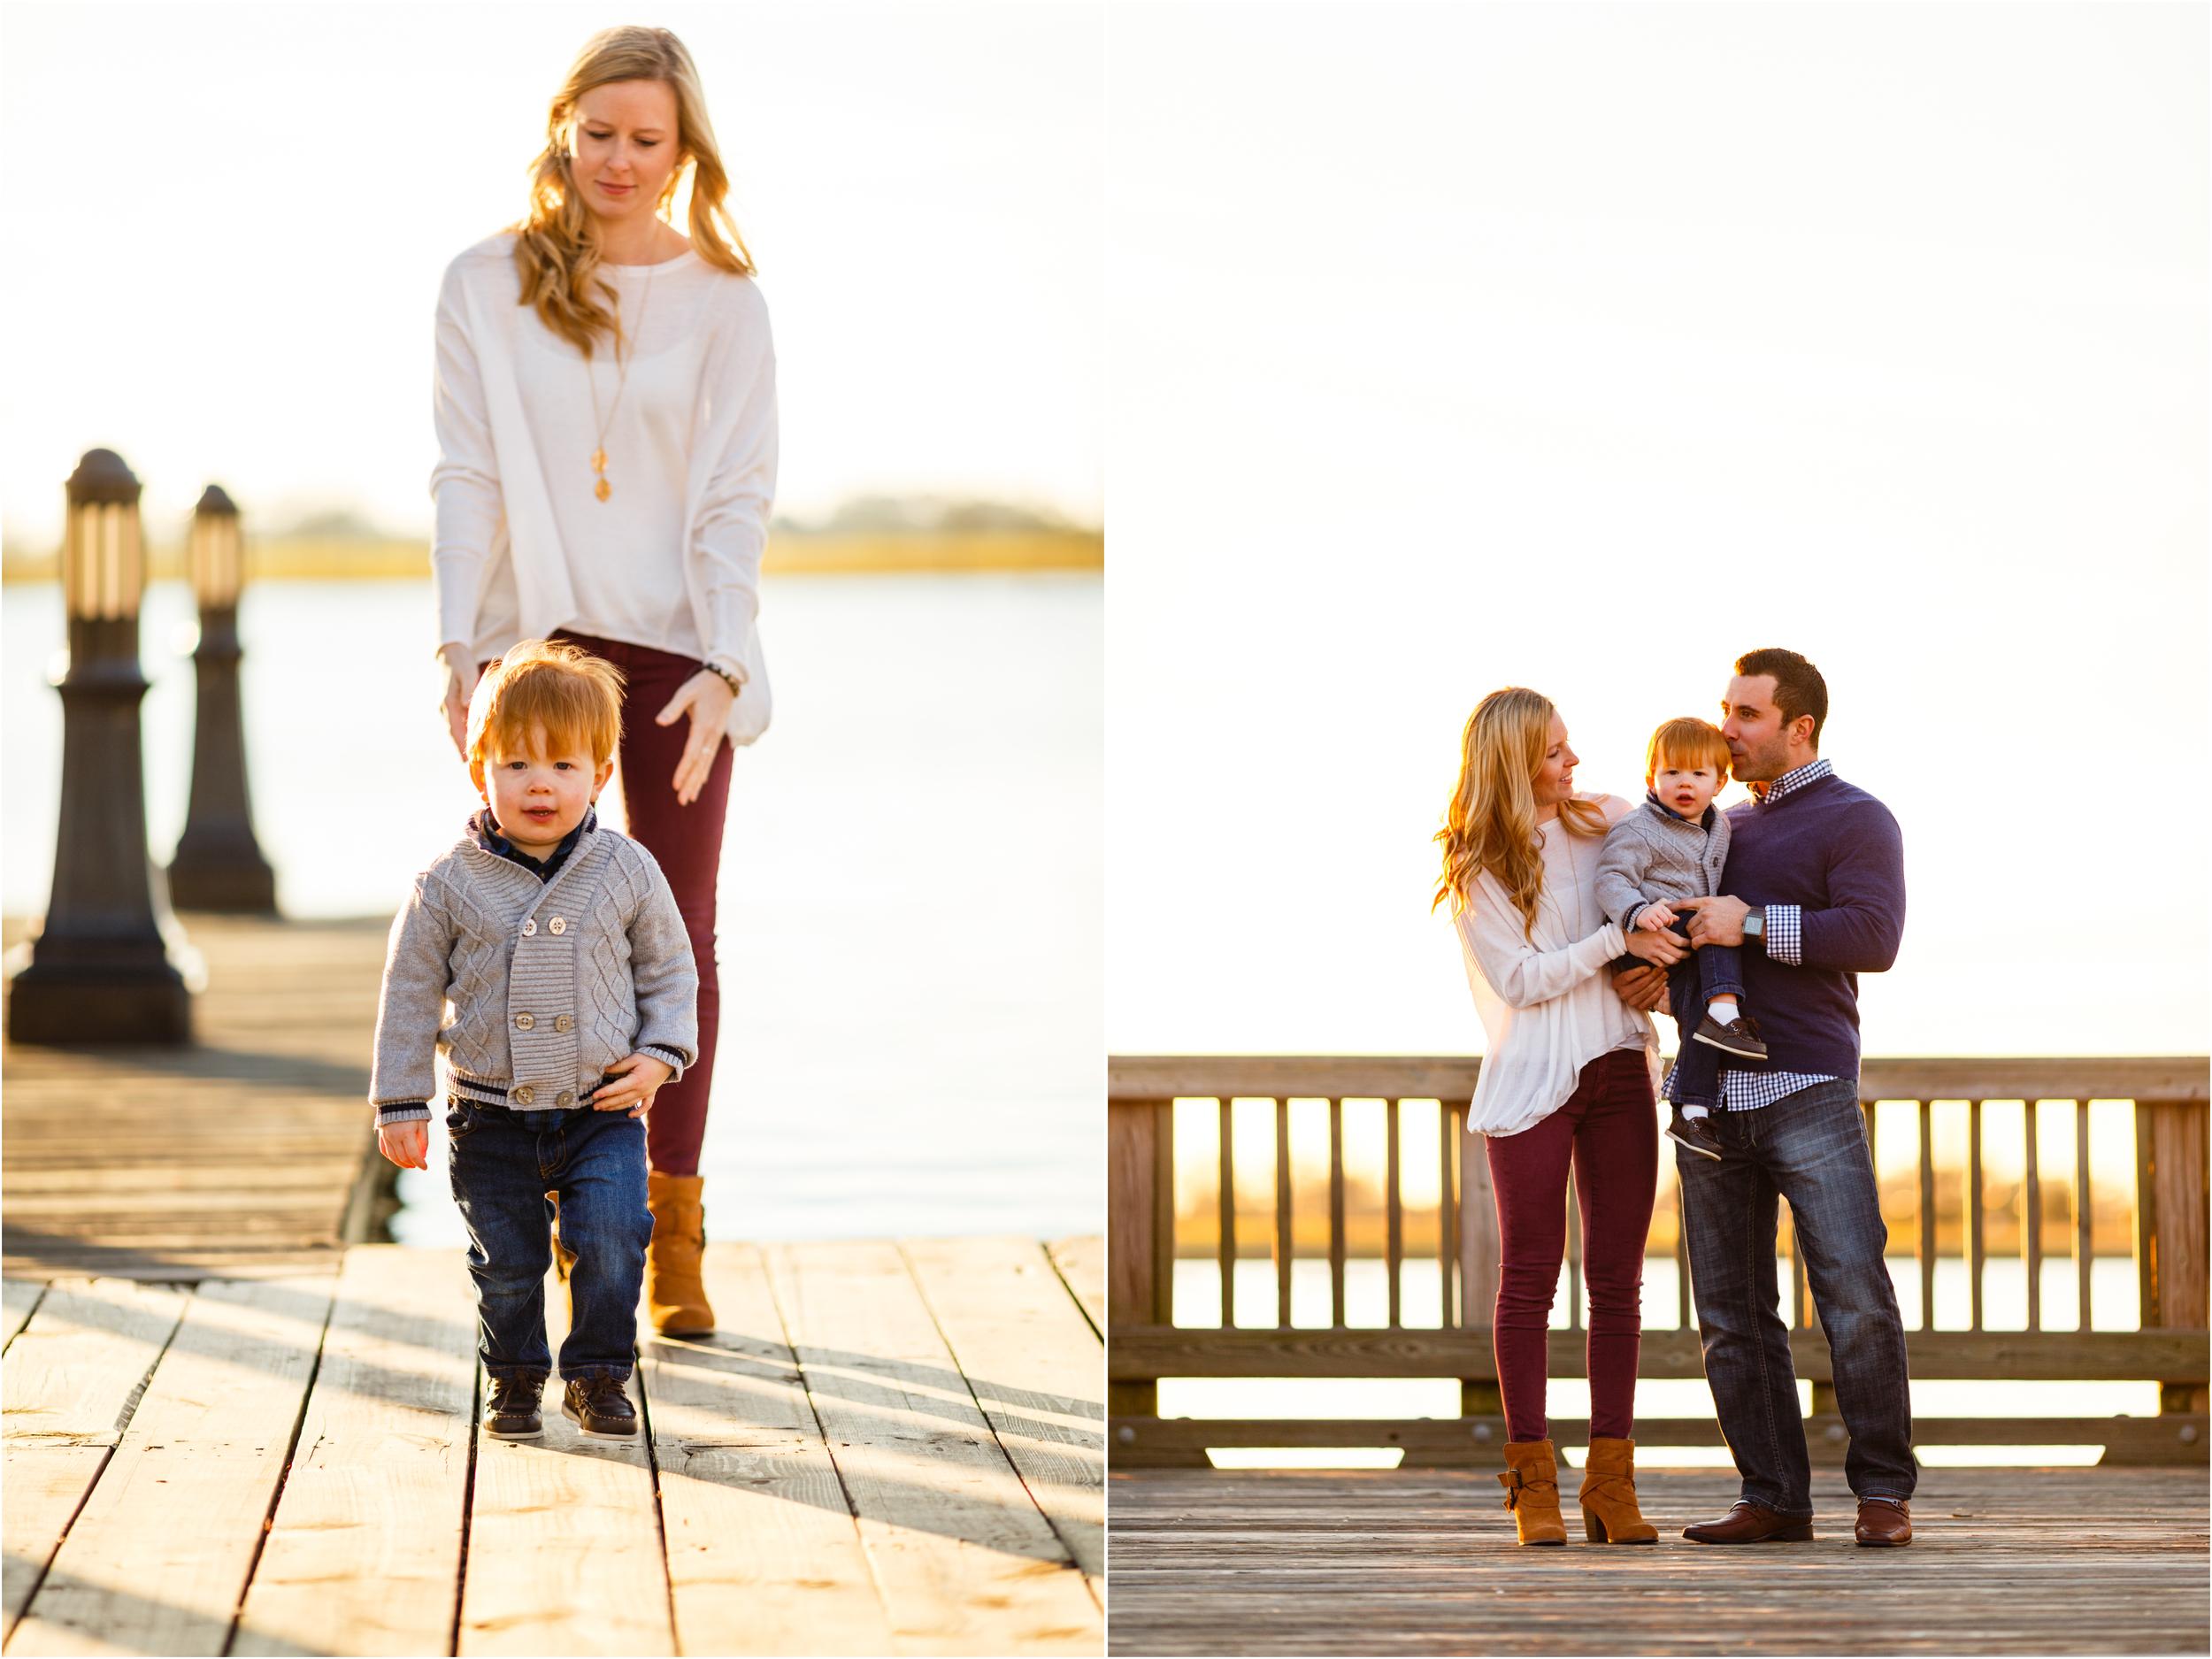 Family-child-portrait-lafayette-broussard-youngsville-photographer (3).jpg